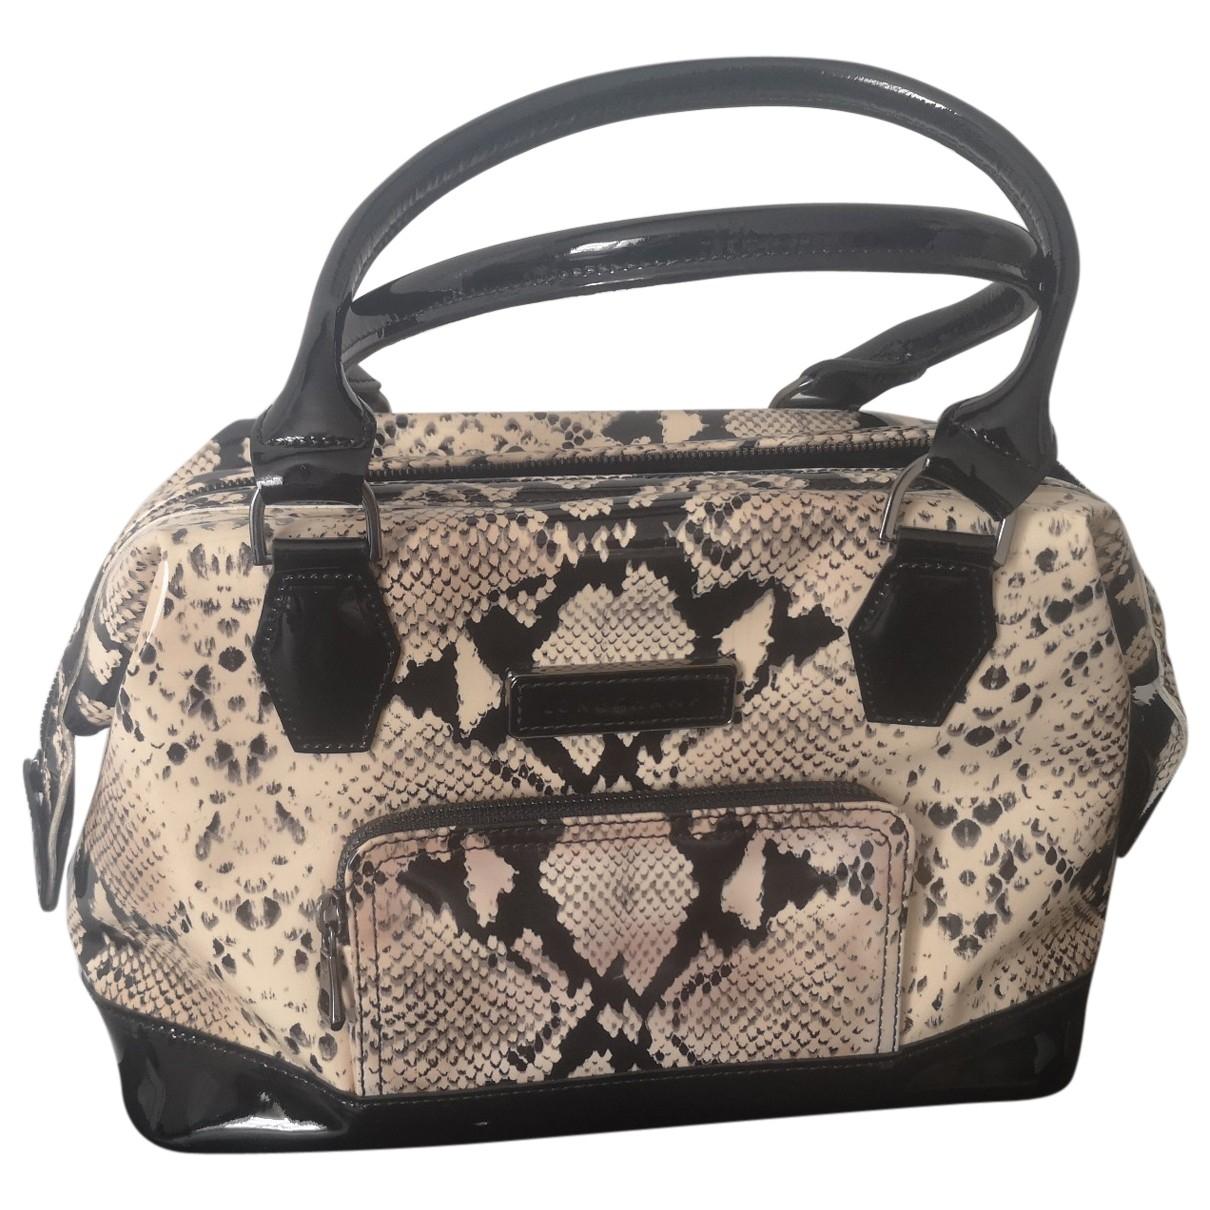 Longchamp Légende Beige Patent leather handbag for Women \N